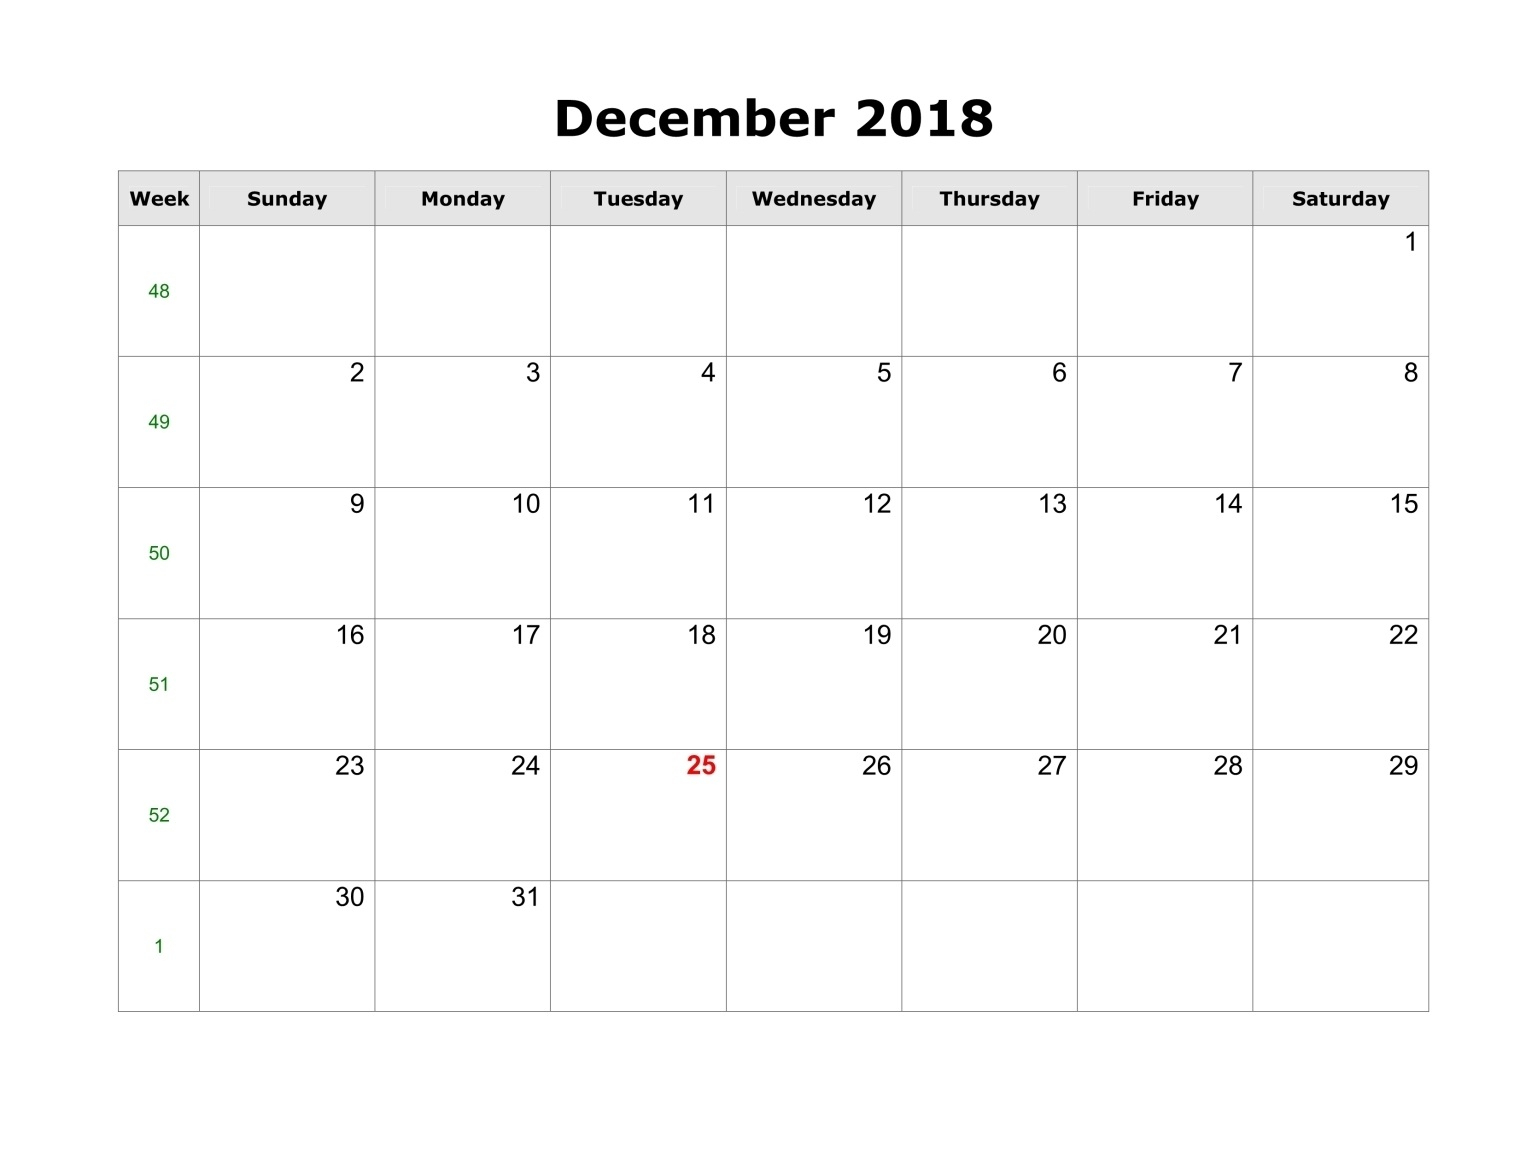 December 2018 Calendar Template Pdf, Word, Excel - Printable in Calendar With Holidays Printable Templates